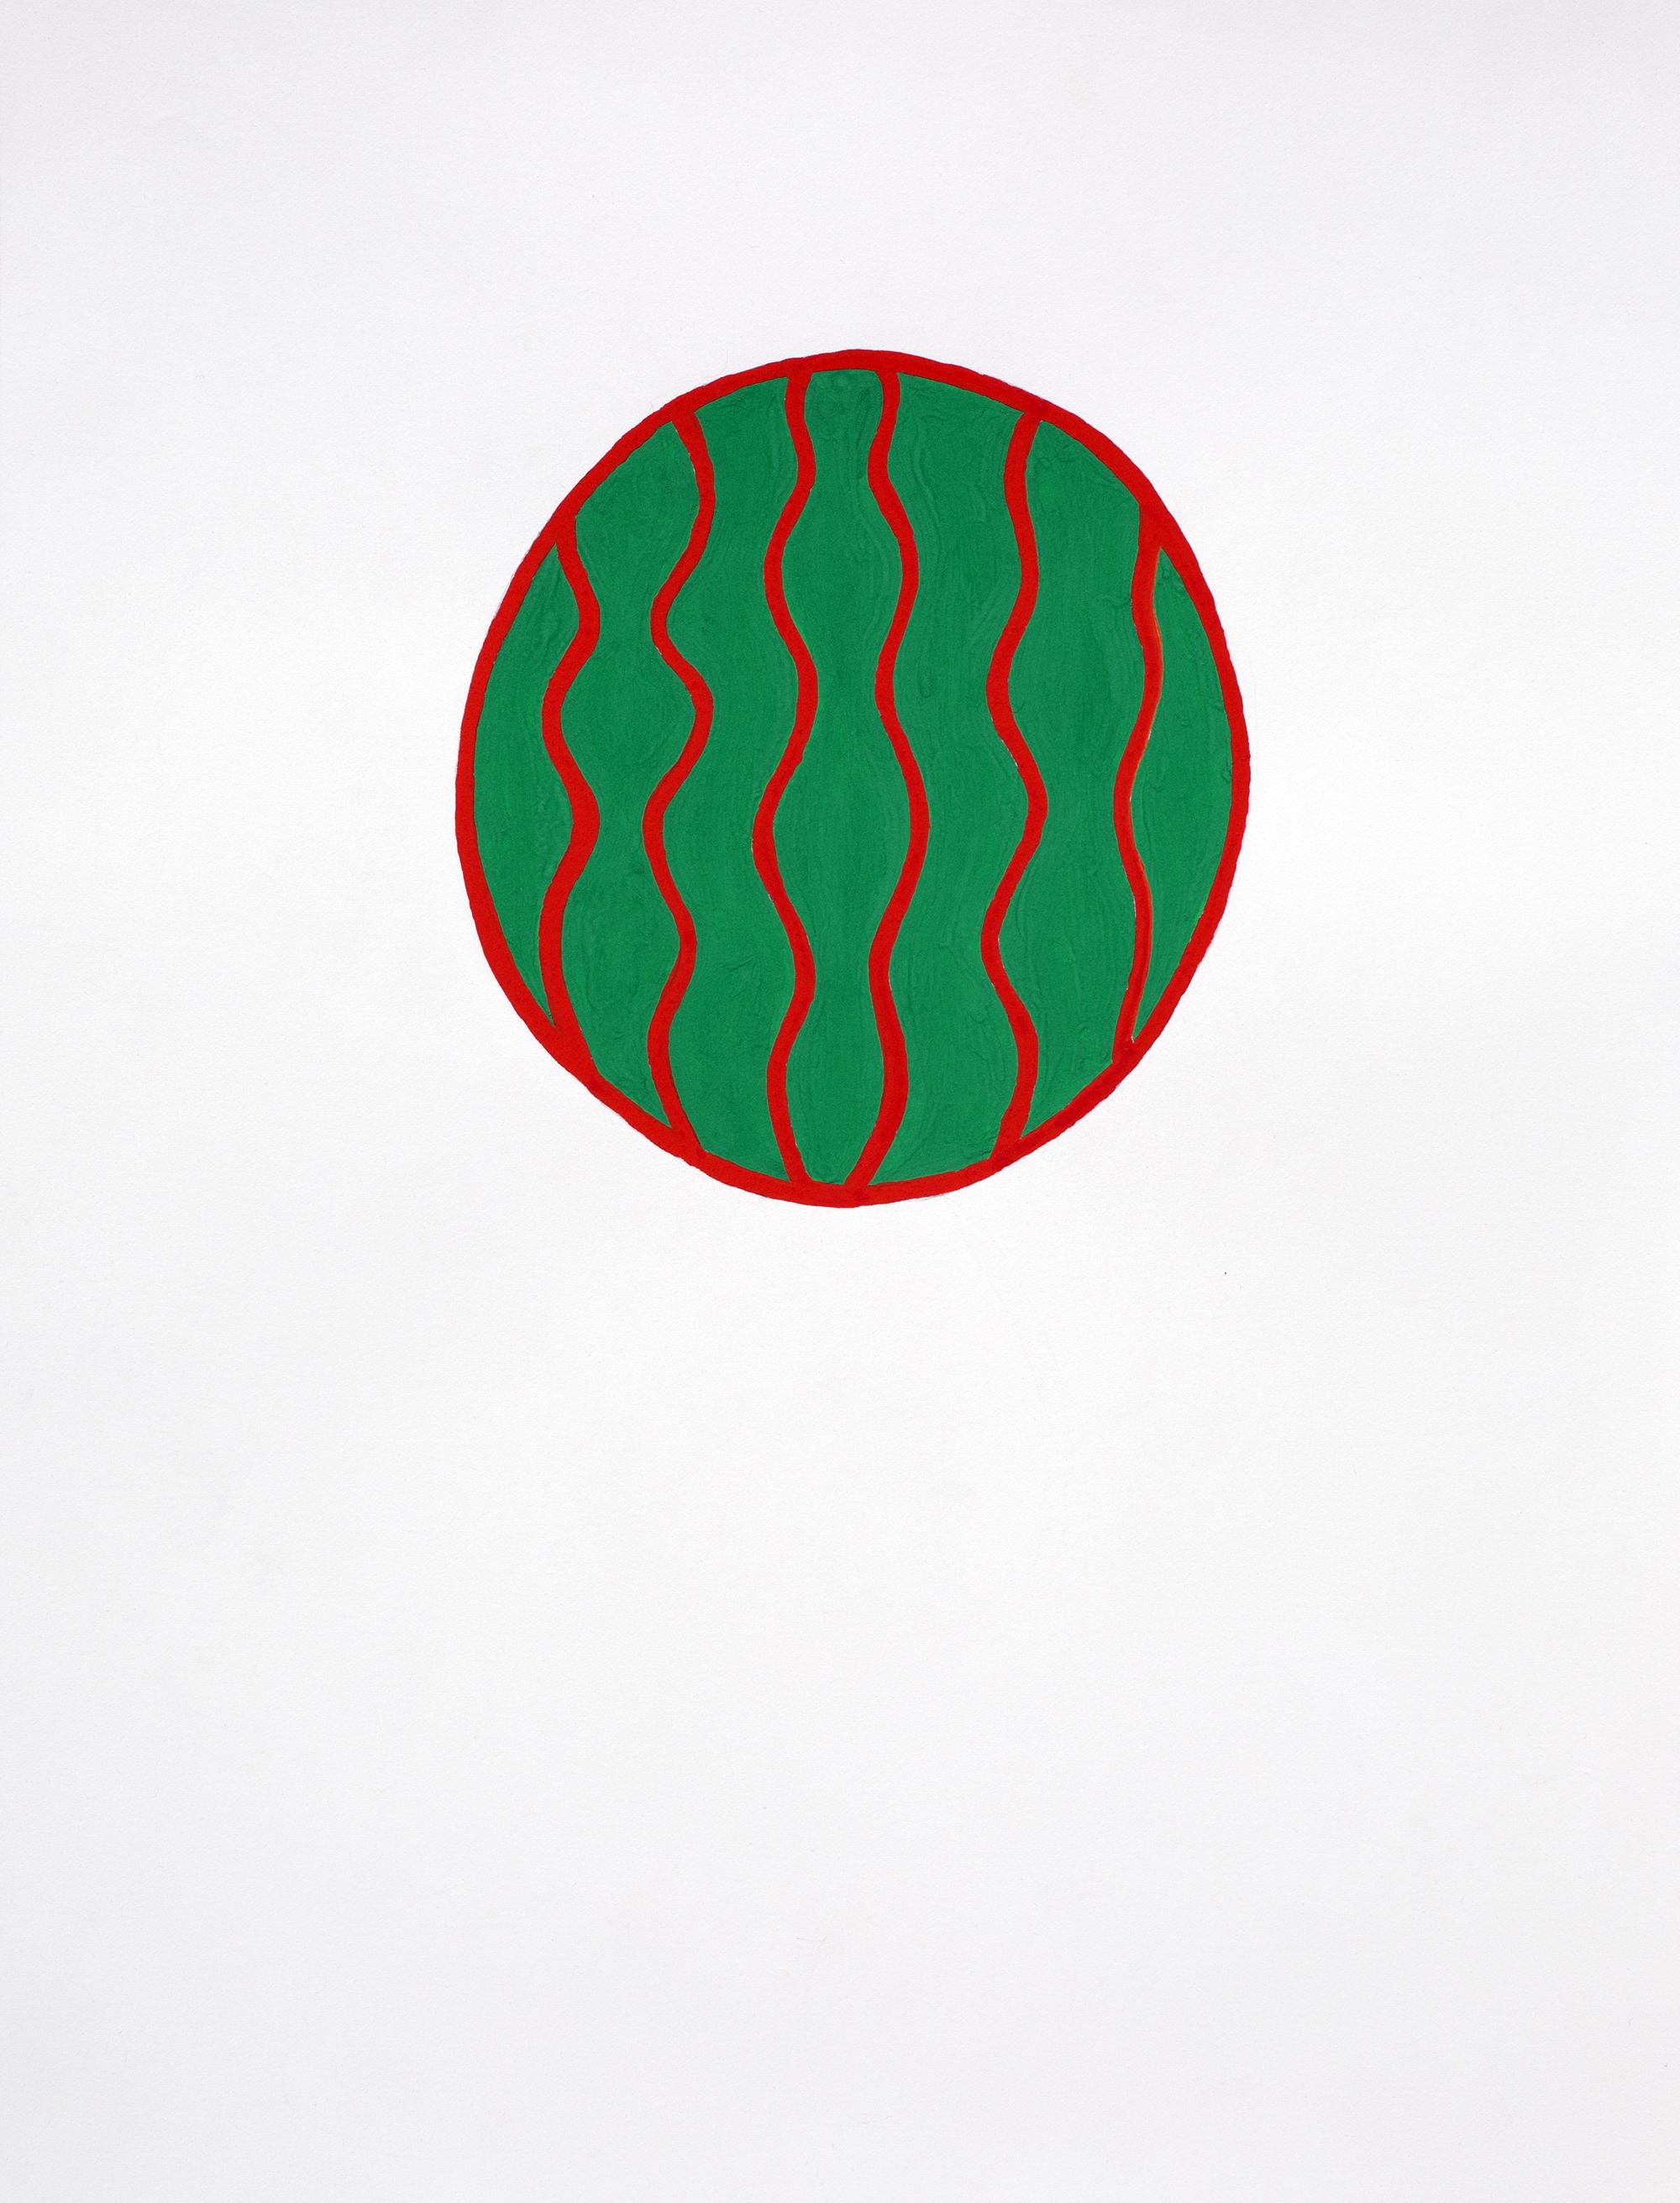 Untitled, 2015, gouache on paper, 30 x 42 cm